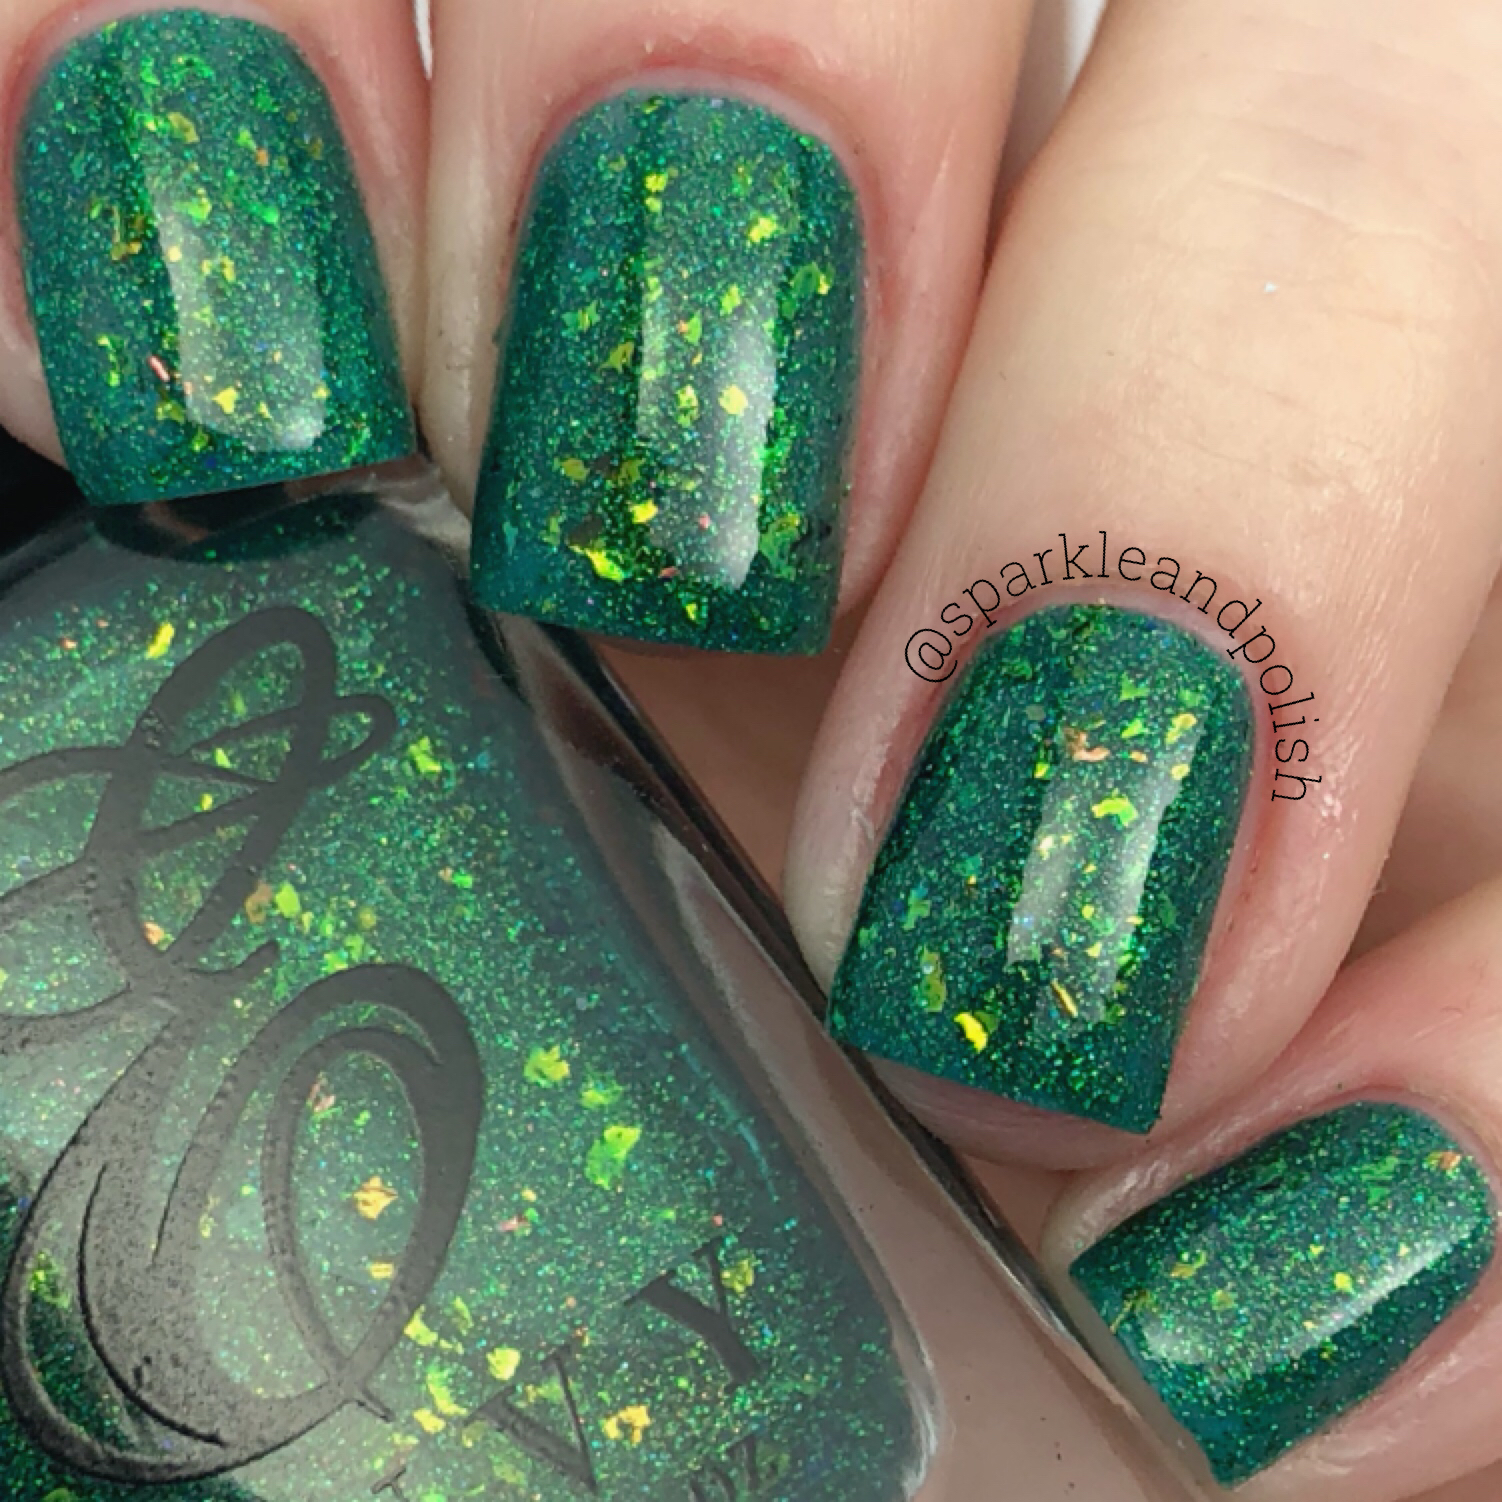 A Little Sparkle and Polish